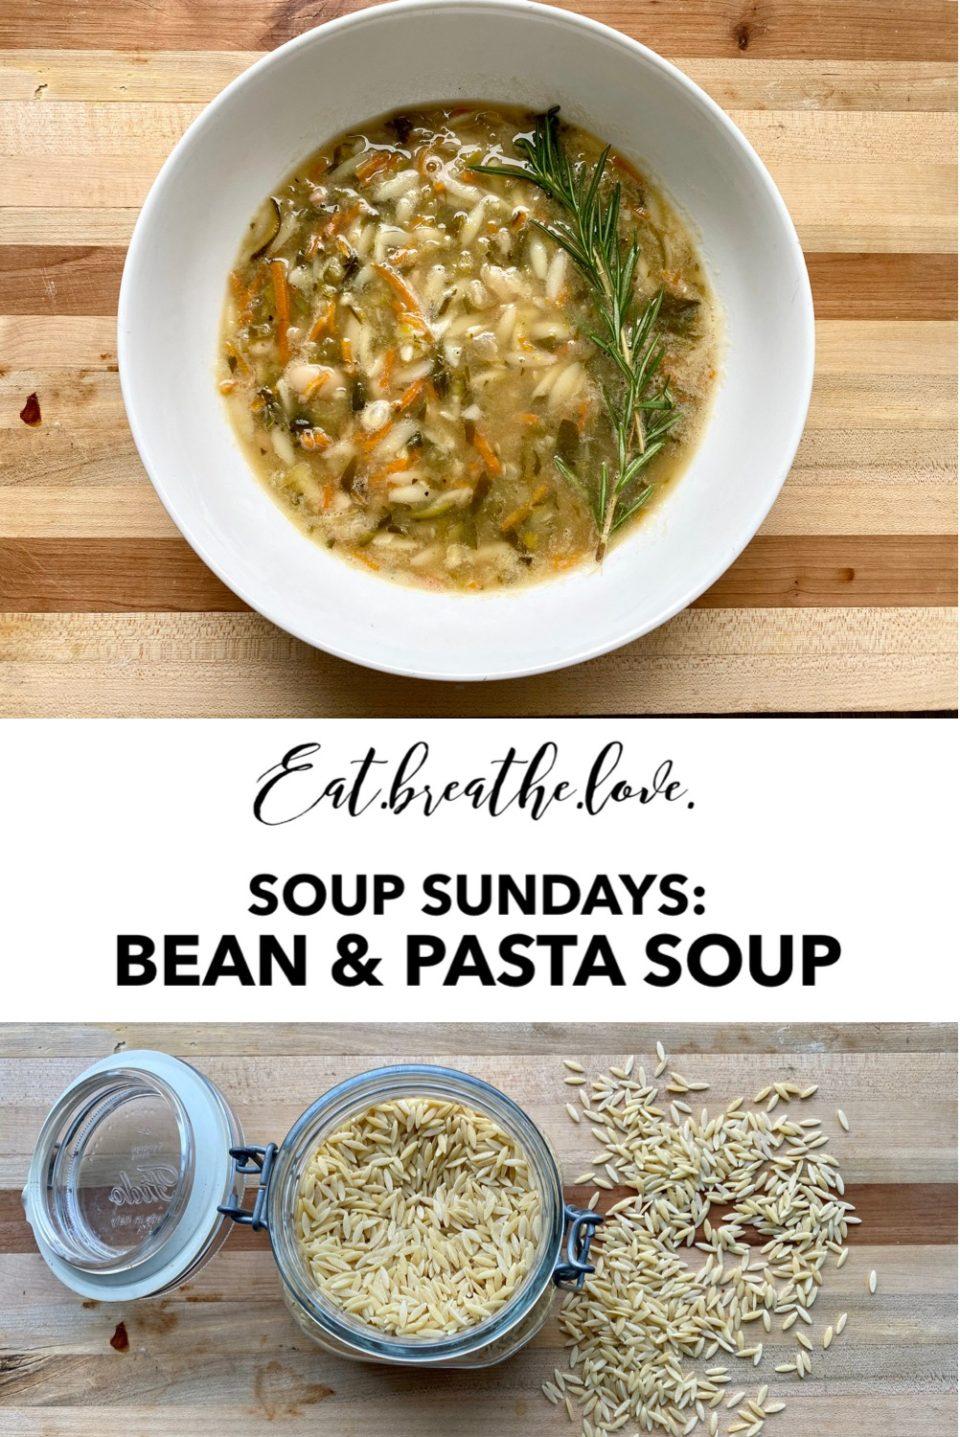 Bean & Pasta Soup || www.eatbreathelove.net